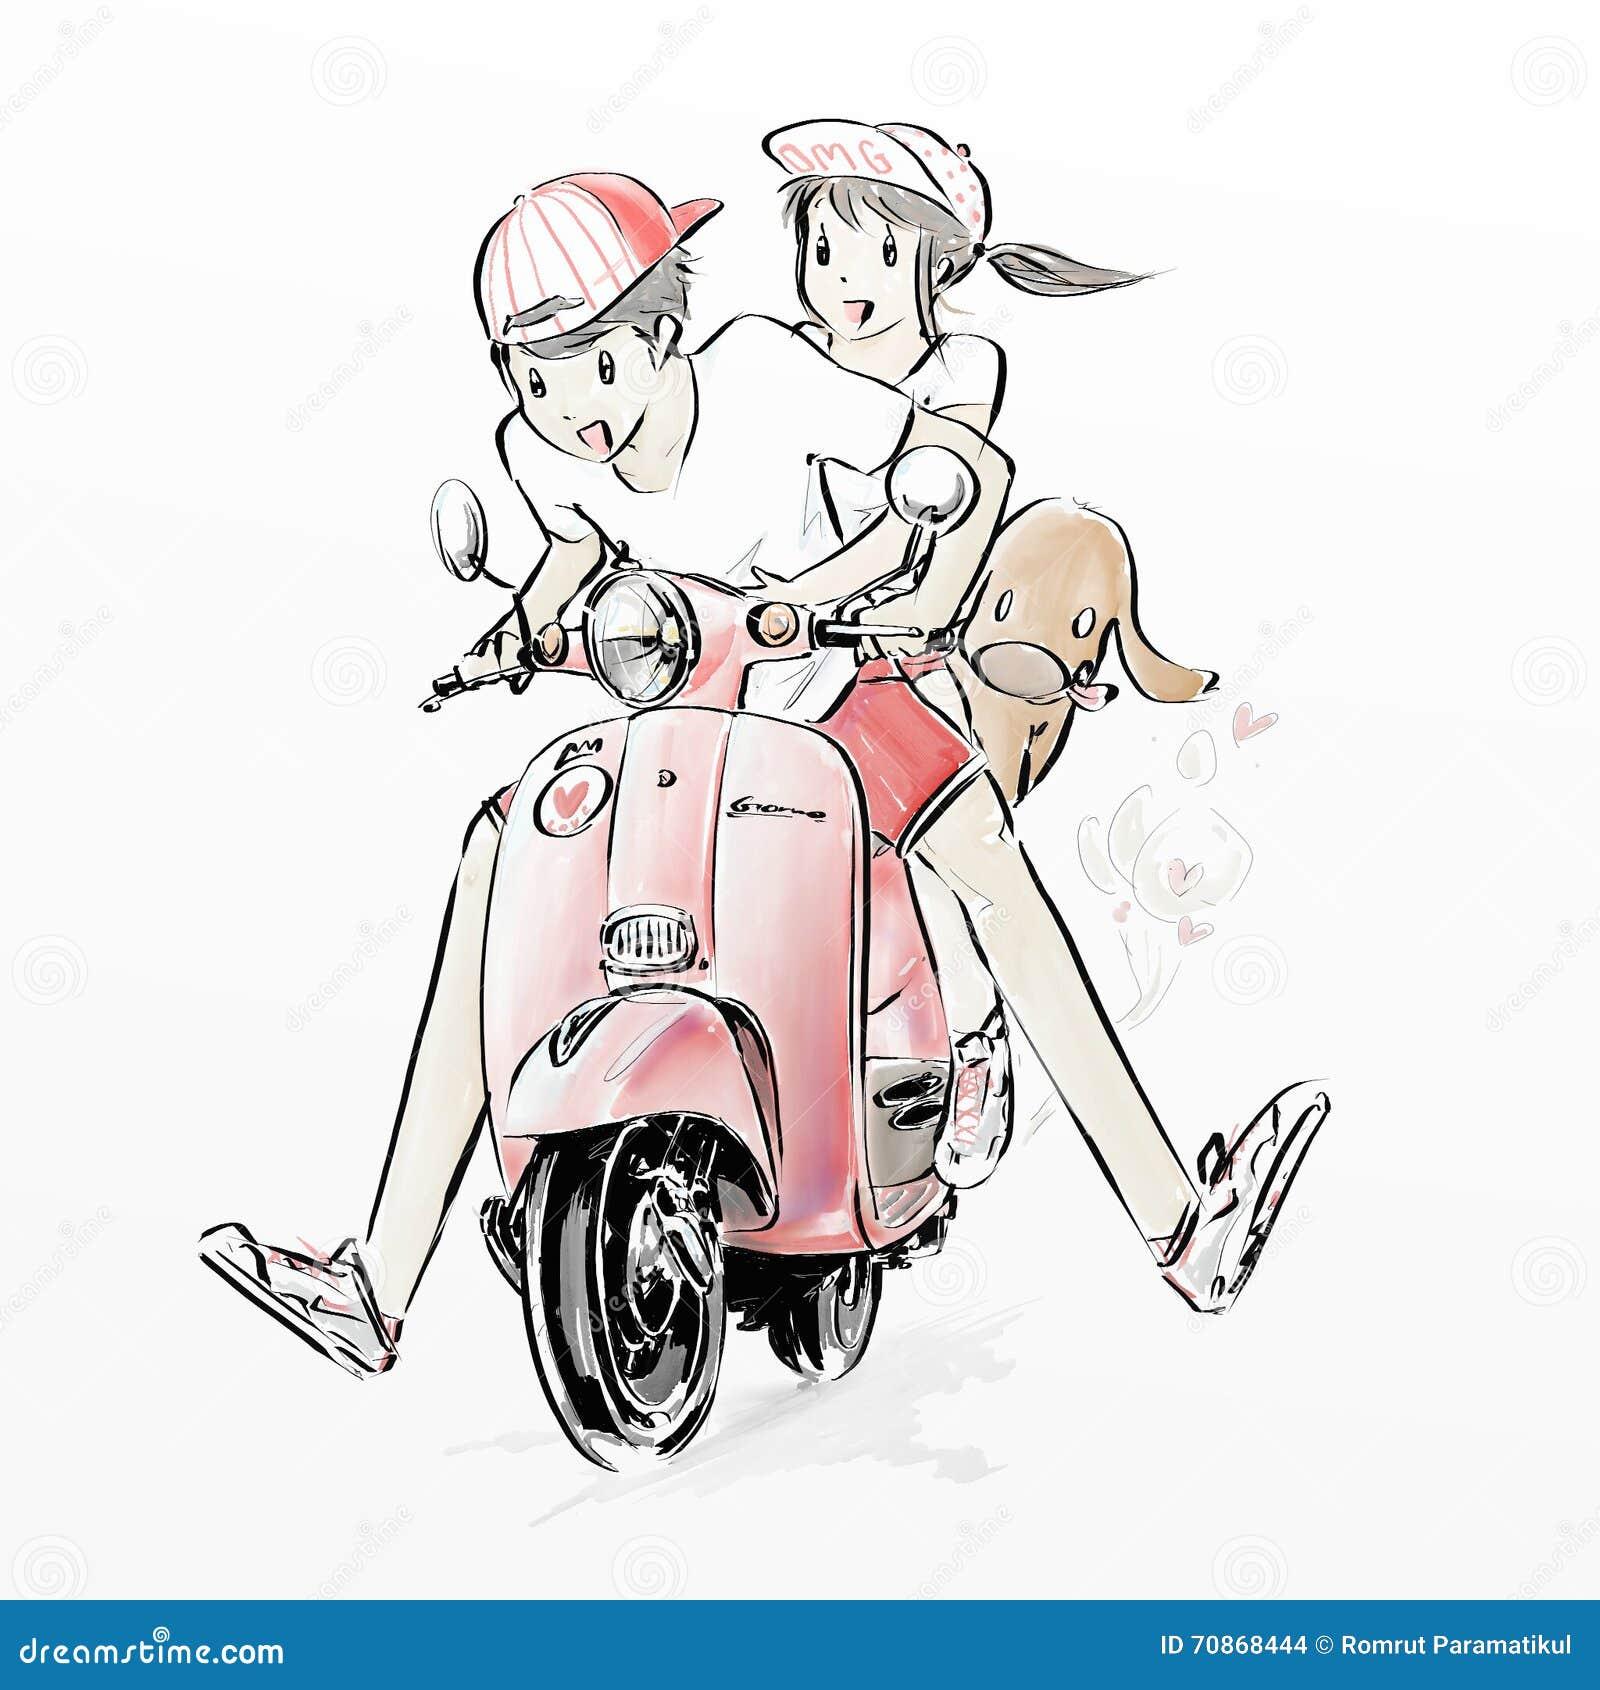 Cute Couple Riding Motorcycle Illustration 70868444 - Megapixl for Couple Sticker Line  54lyp